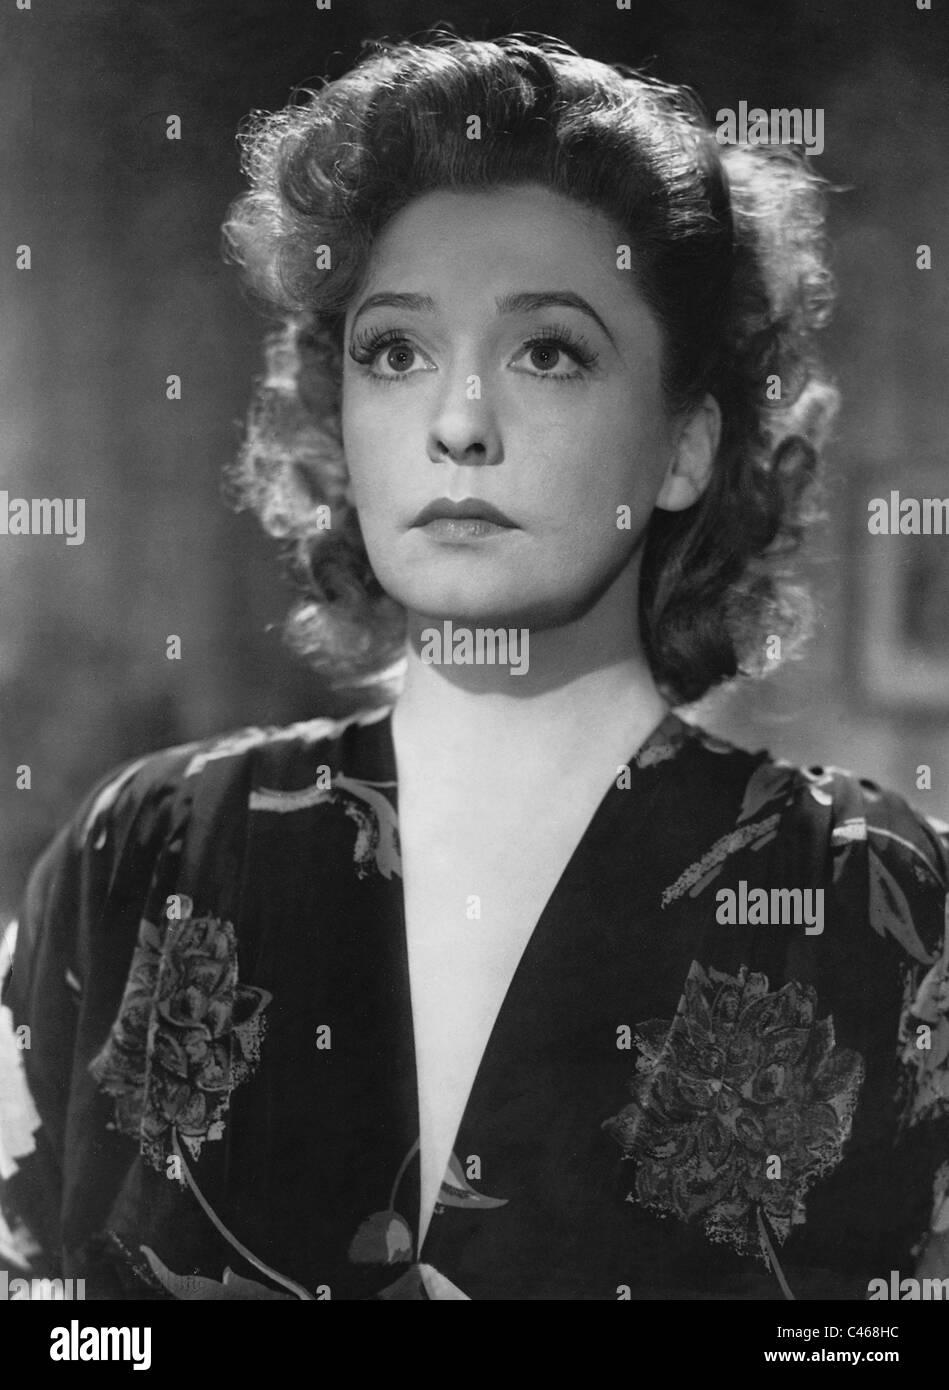 Zarah Leander, 1943 Stock Photo: 36997941 - Alamy  |Zarah Leander Live 1973